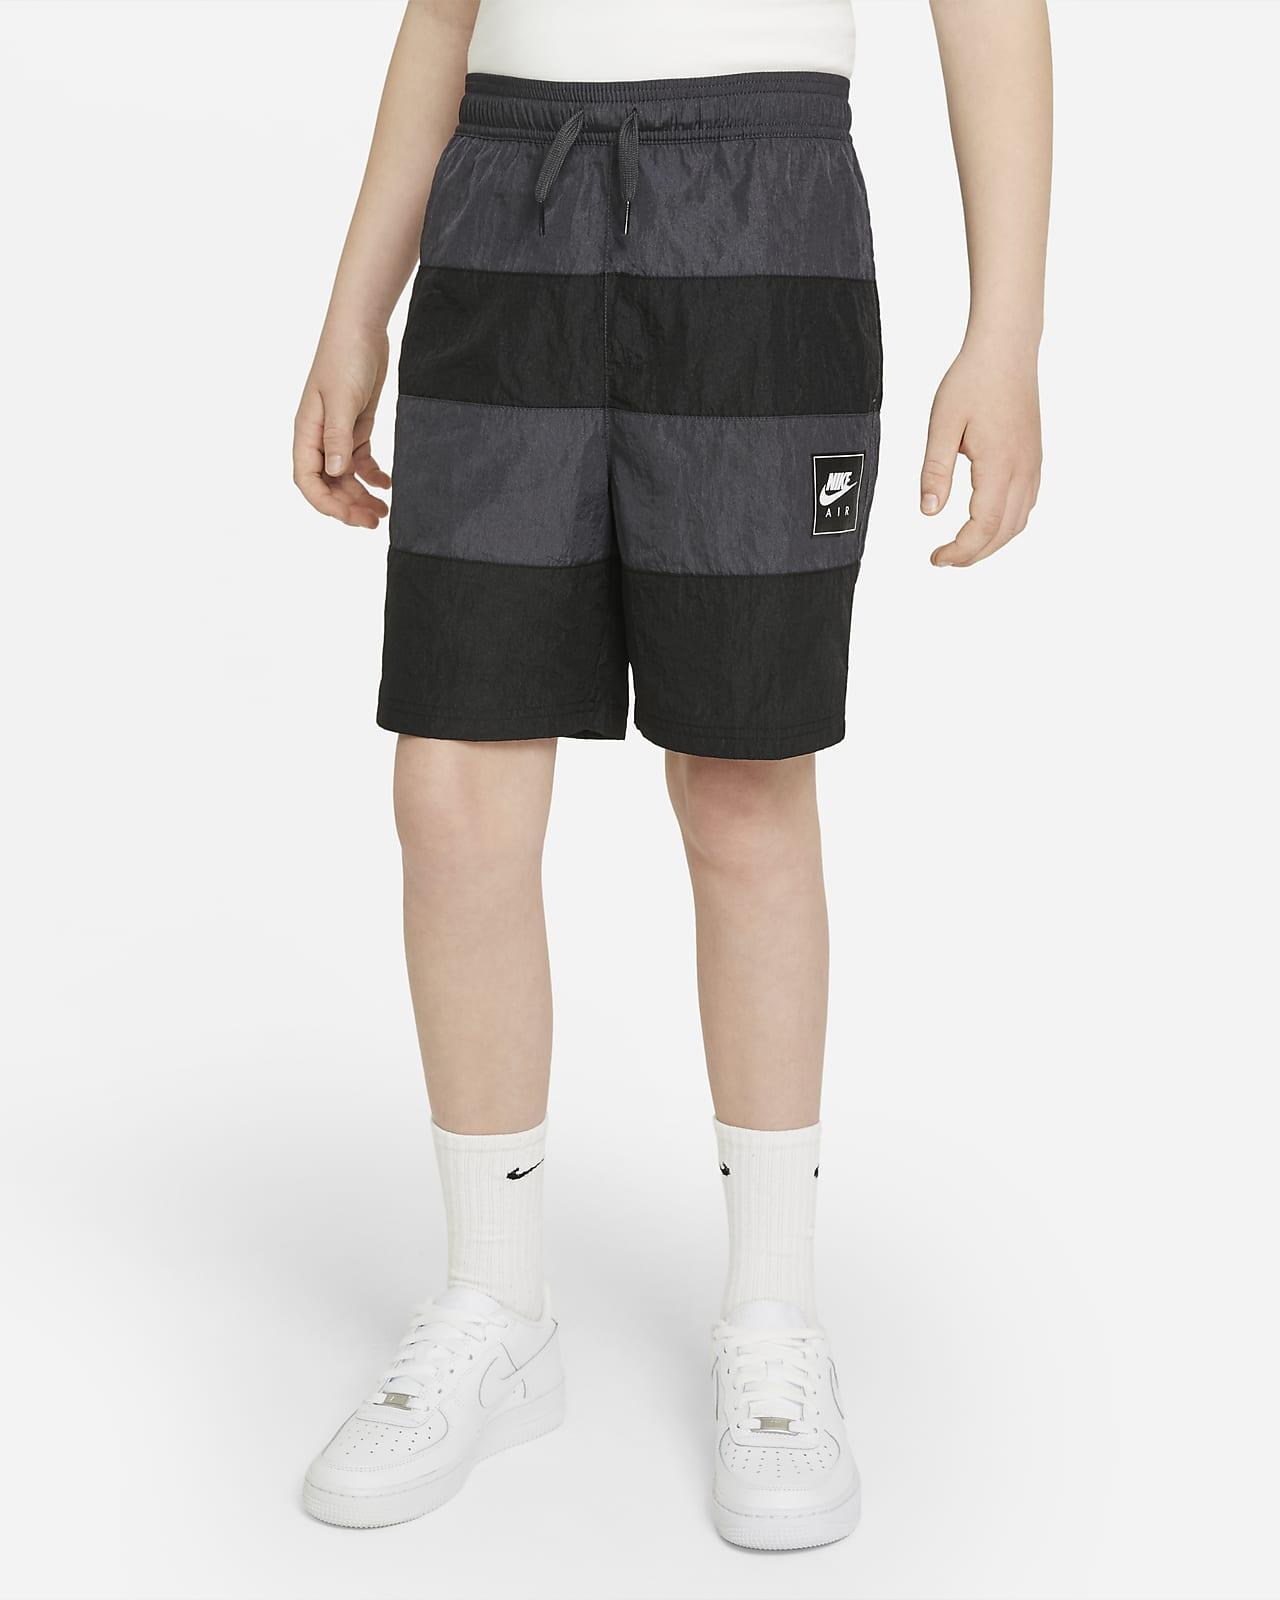 Nike Air Older Kids' (Boys') Woven Shorts